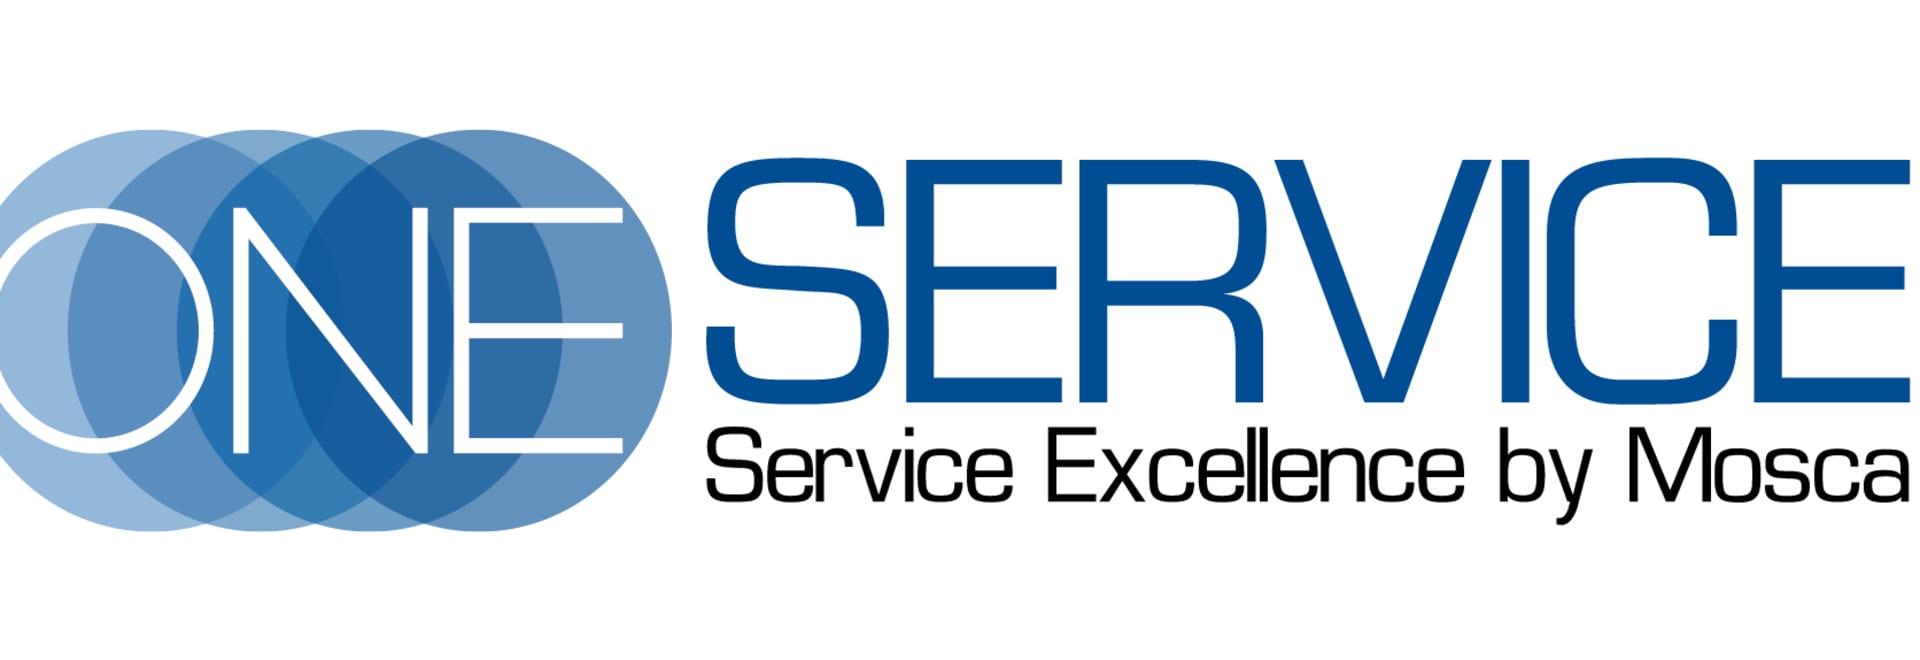 Service concept at MOSCA